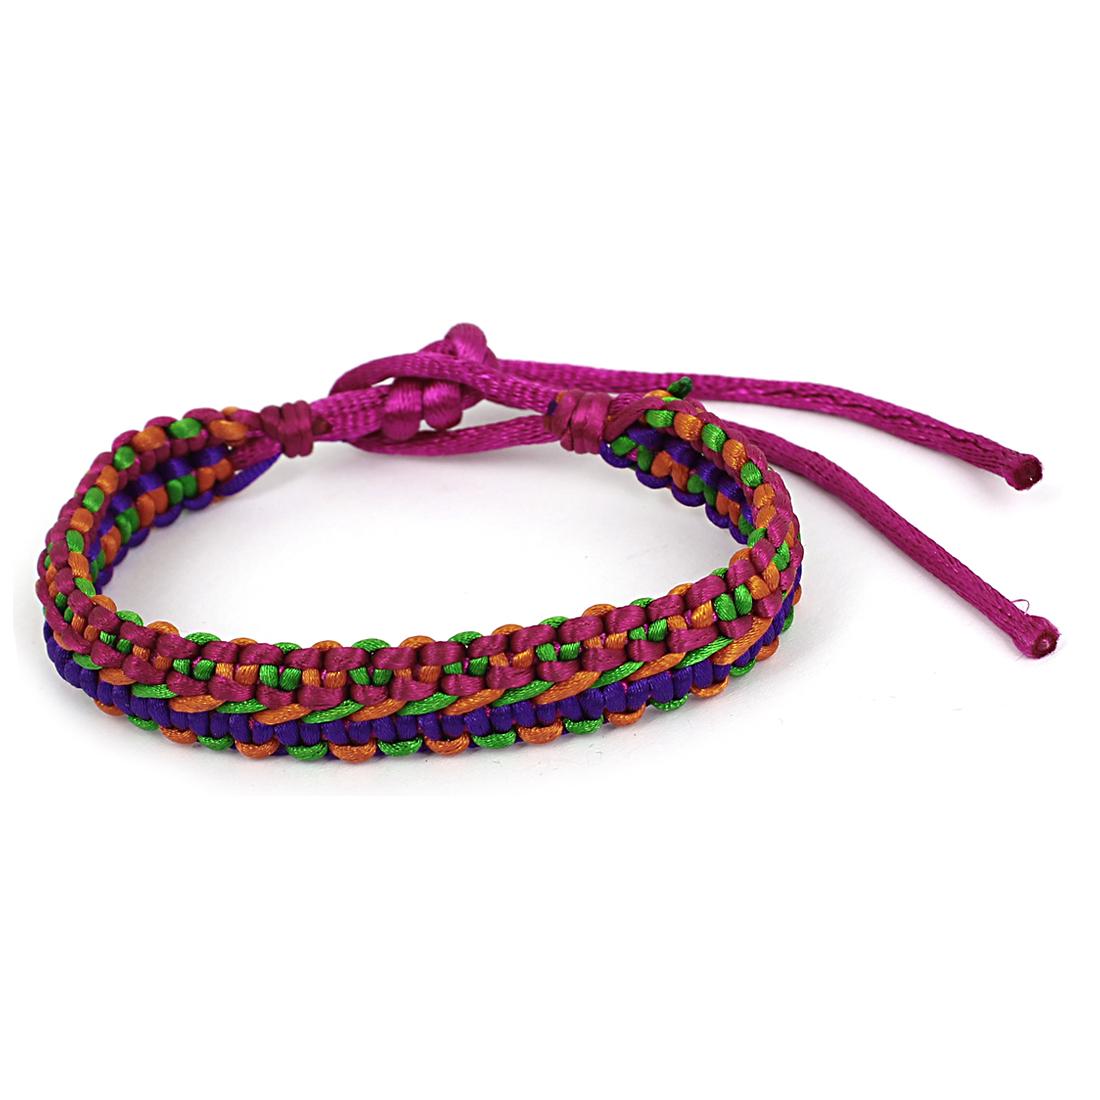 Fuchsia Nylon Lucky Handmade Braid Wrist Bracelet Rope